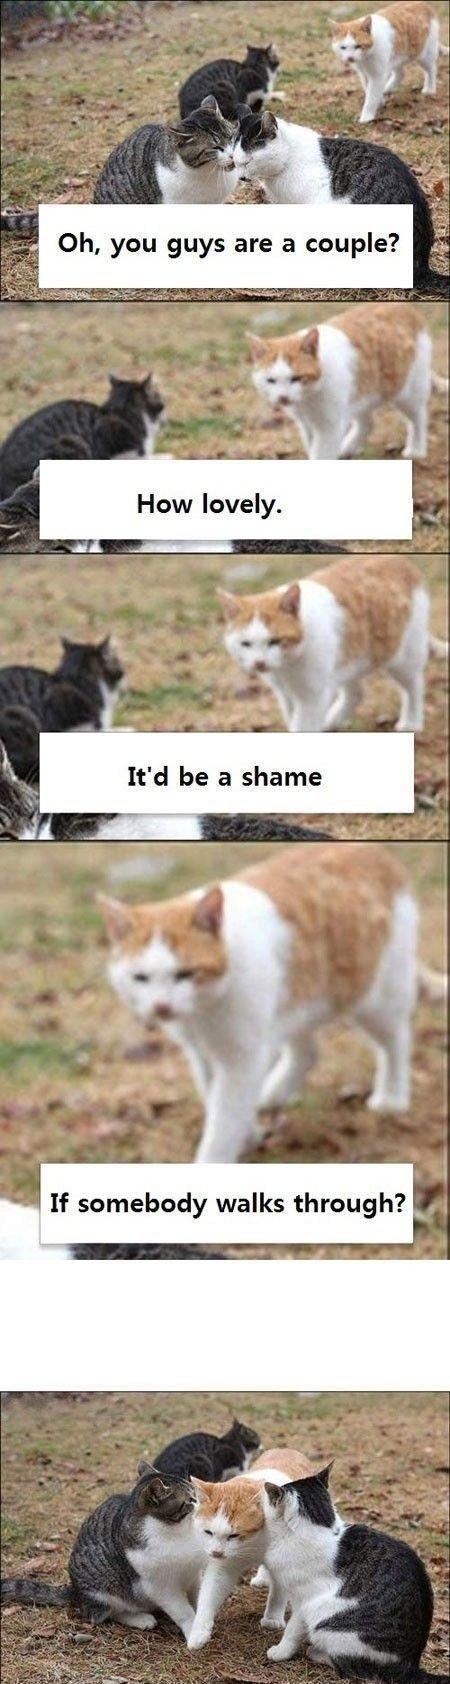 Couple. Three cats. If walks through?